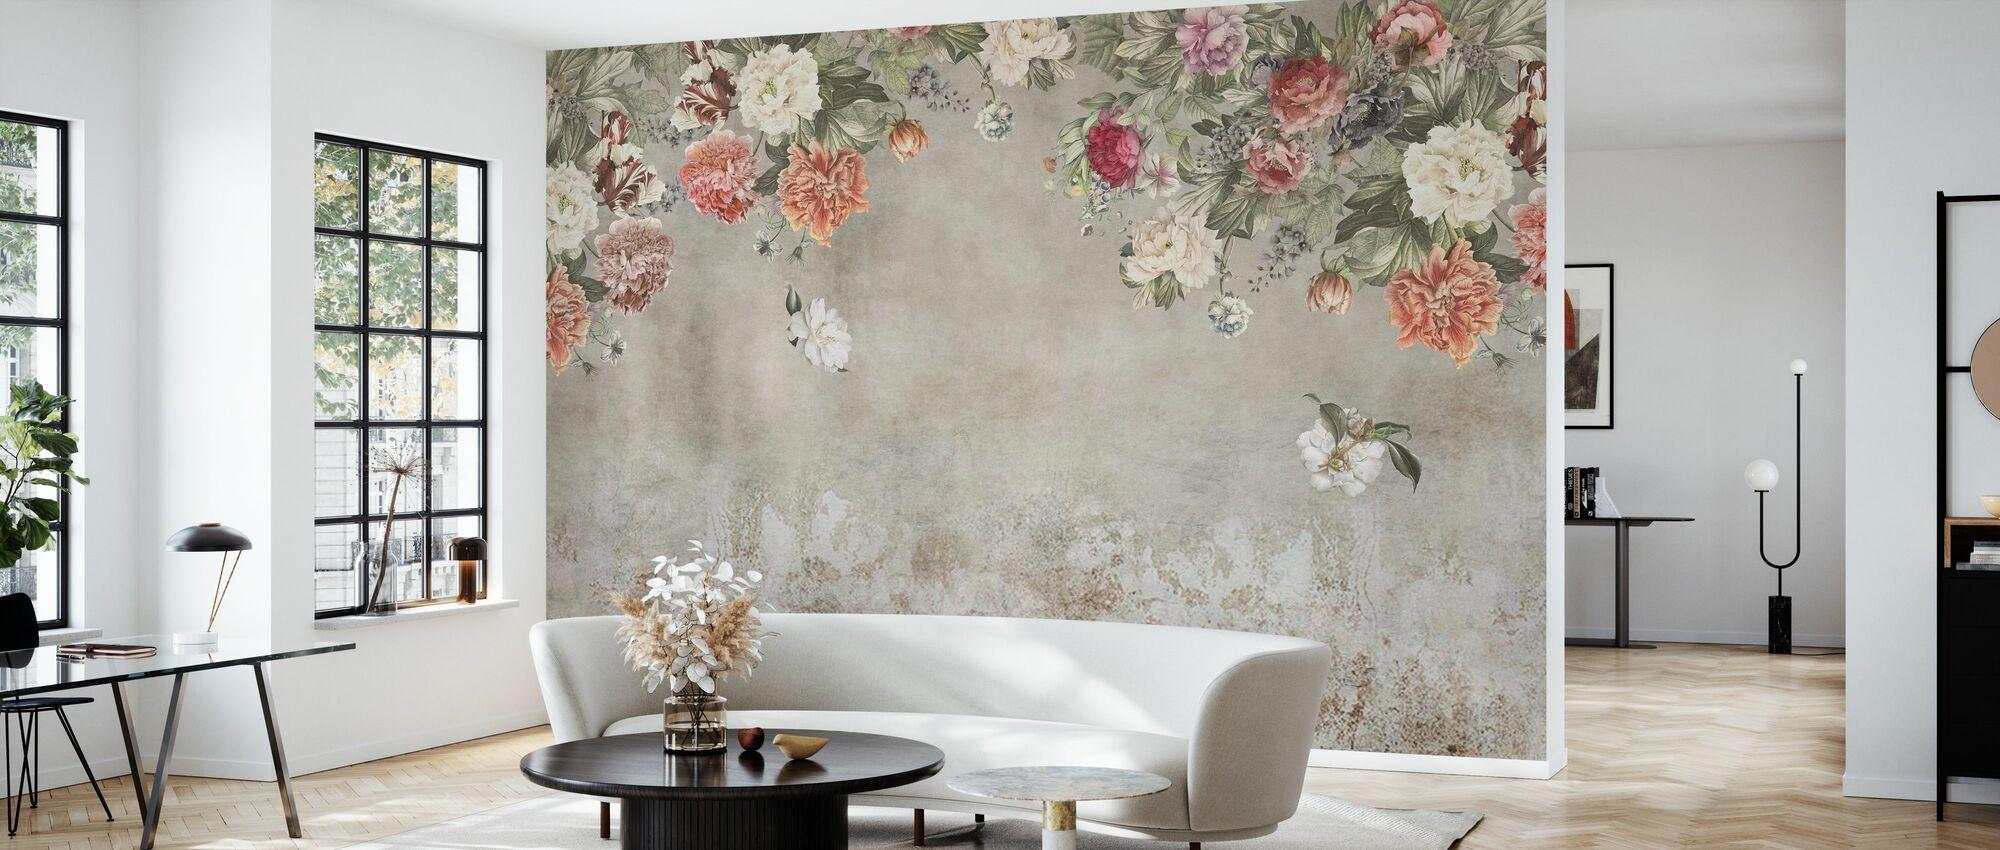 Vintage Flower Wall - Wallpaper - Living Room